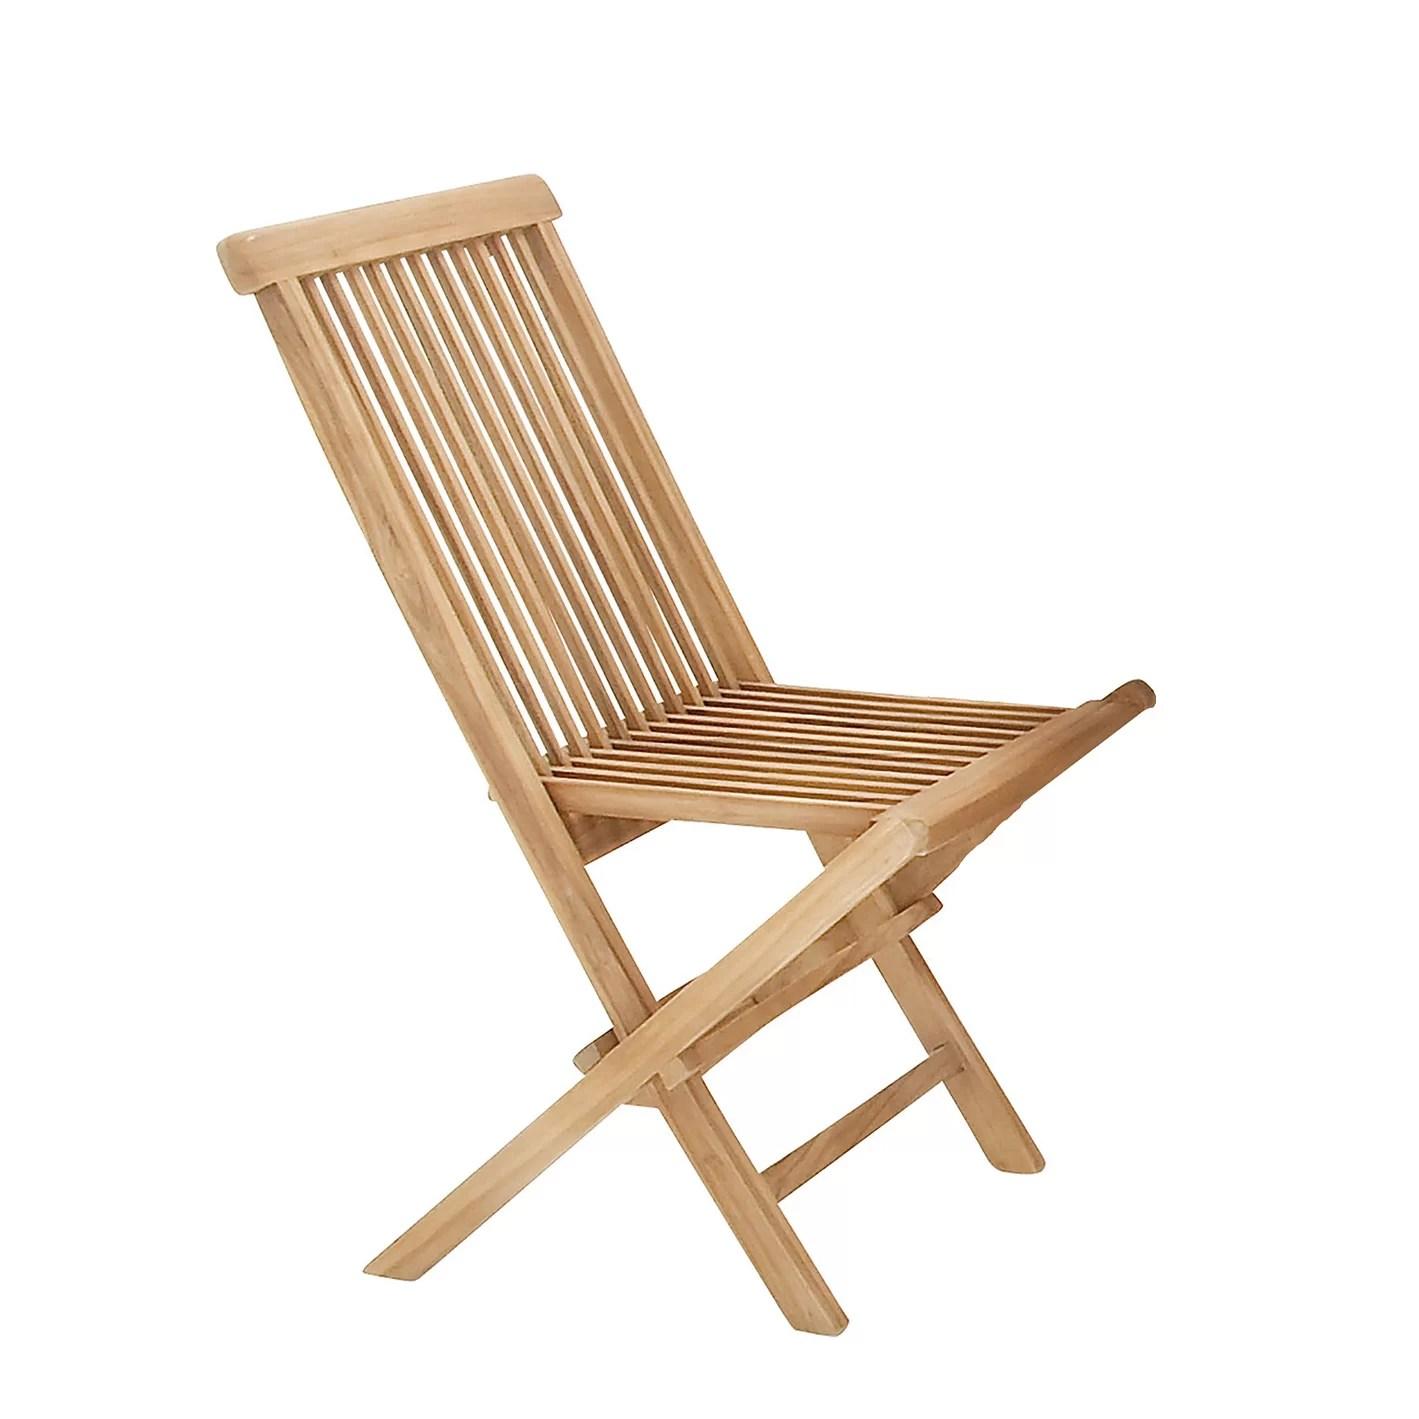 teak folding chair silver dining room chairs urban designs wood 5 piece set